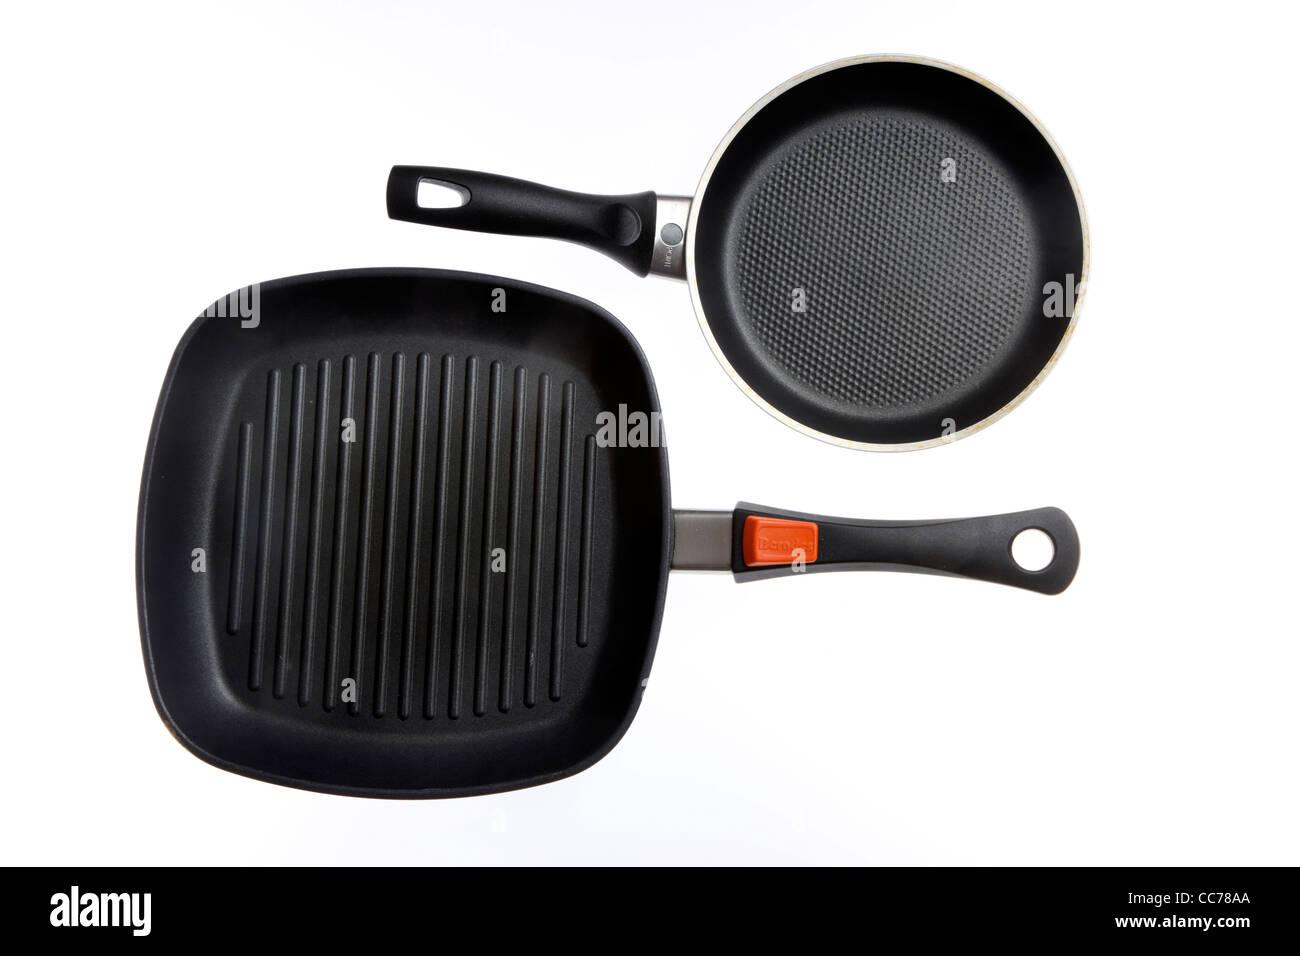 Compilation of various kitchen utensils, kitchen tools. Teflon pans. Steak pan. Stock Photo